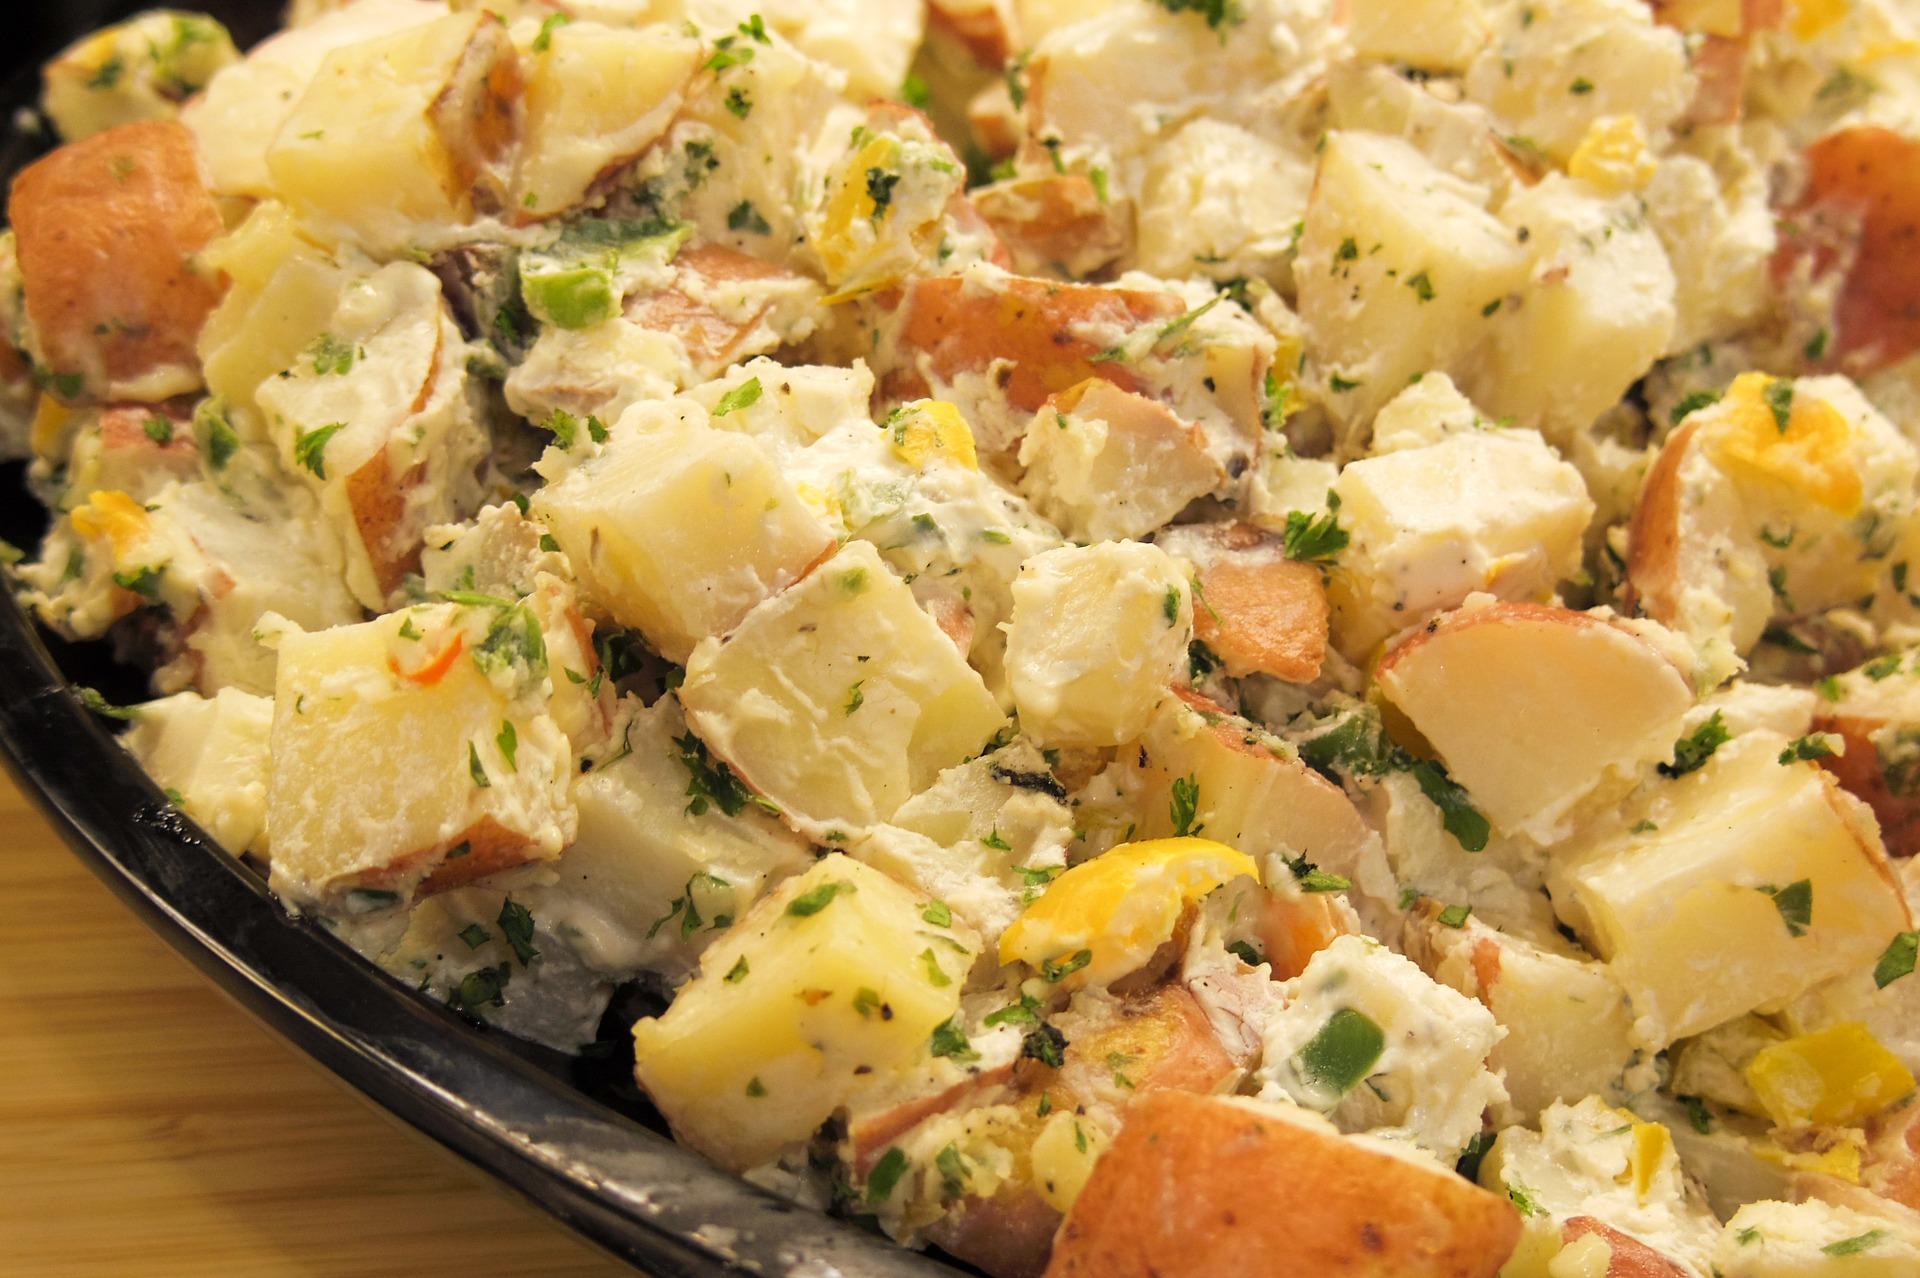 Insalata patate tonno uova sode